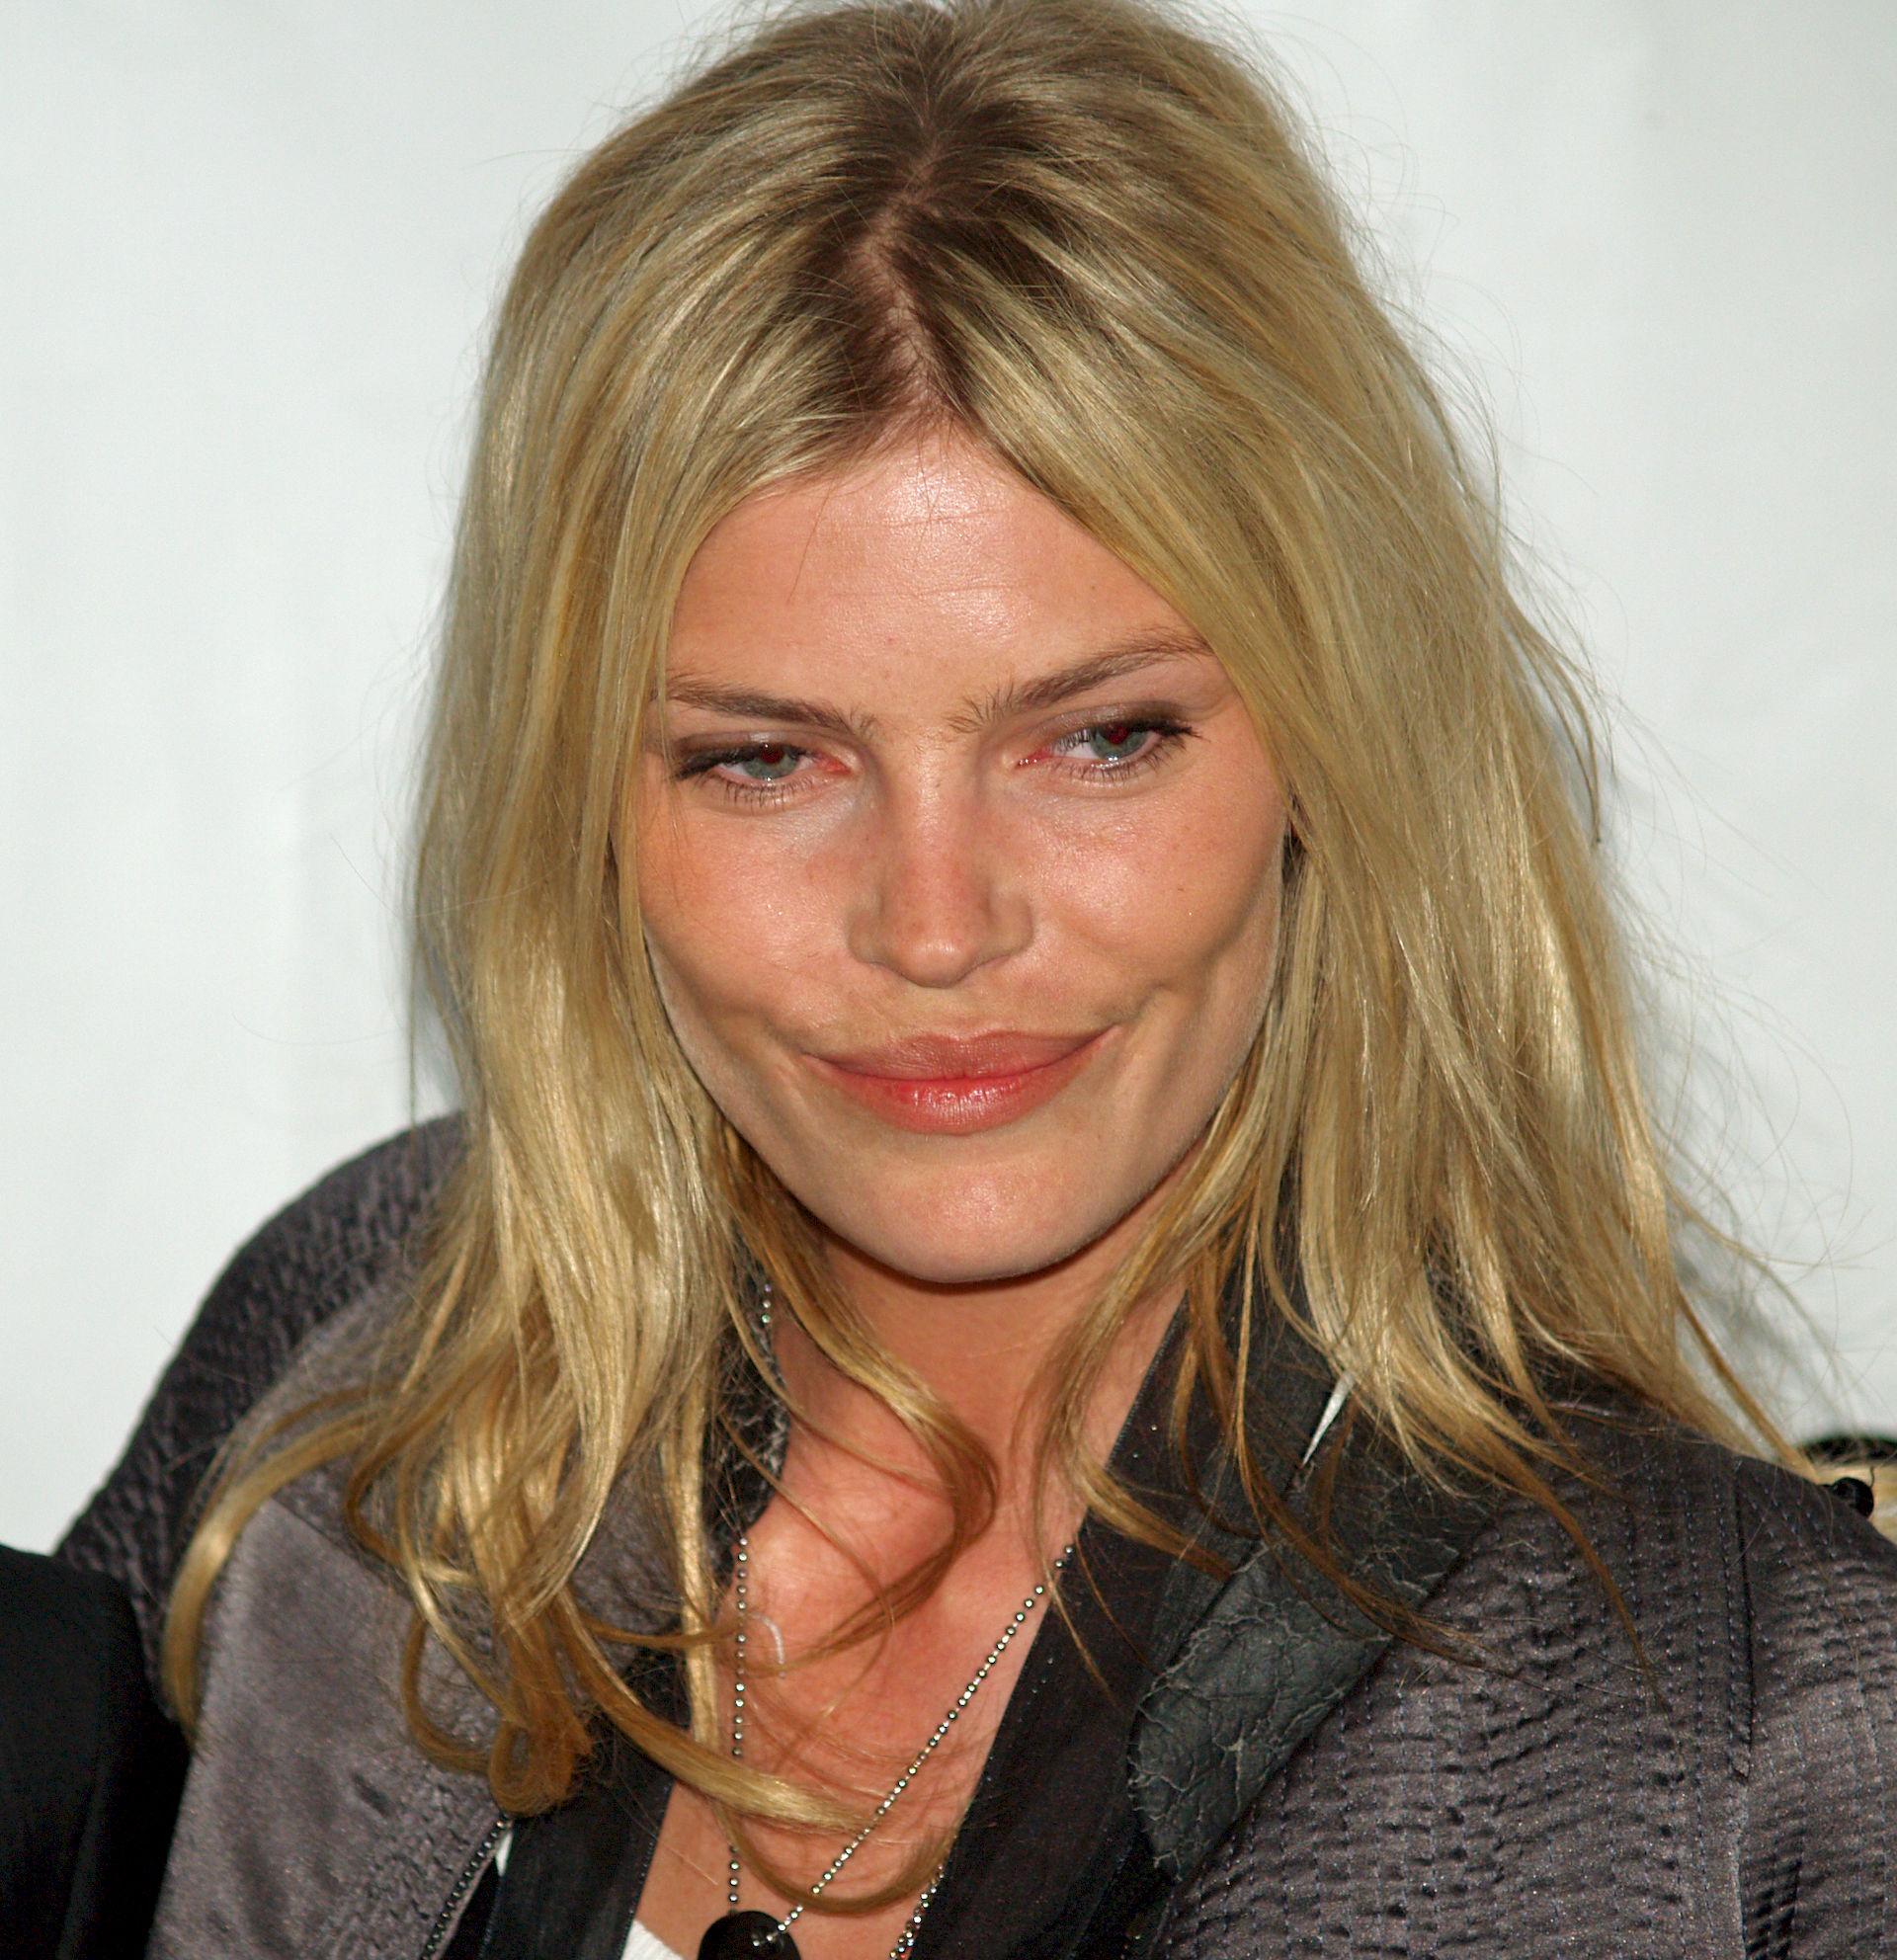 Photo of May Andersen: Danish supermodel